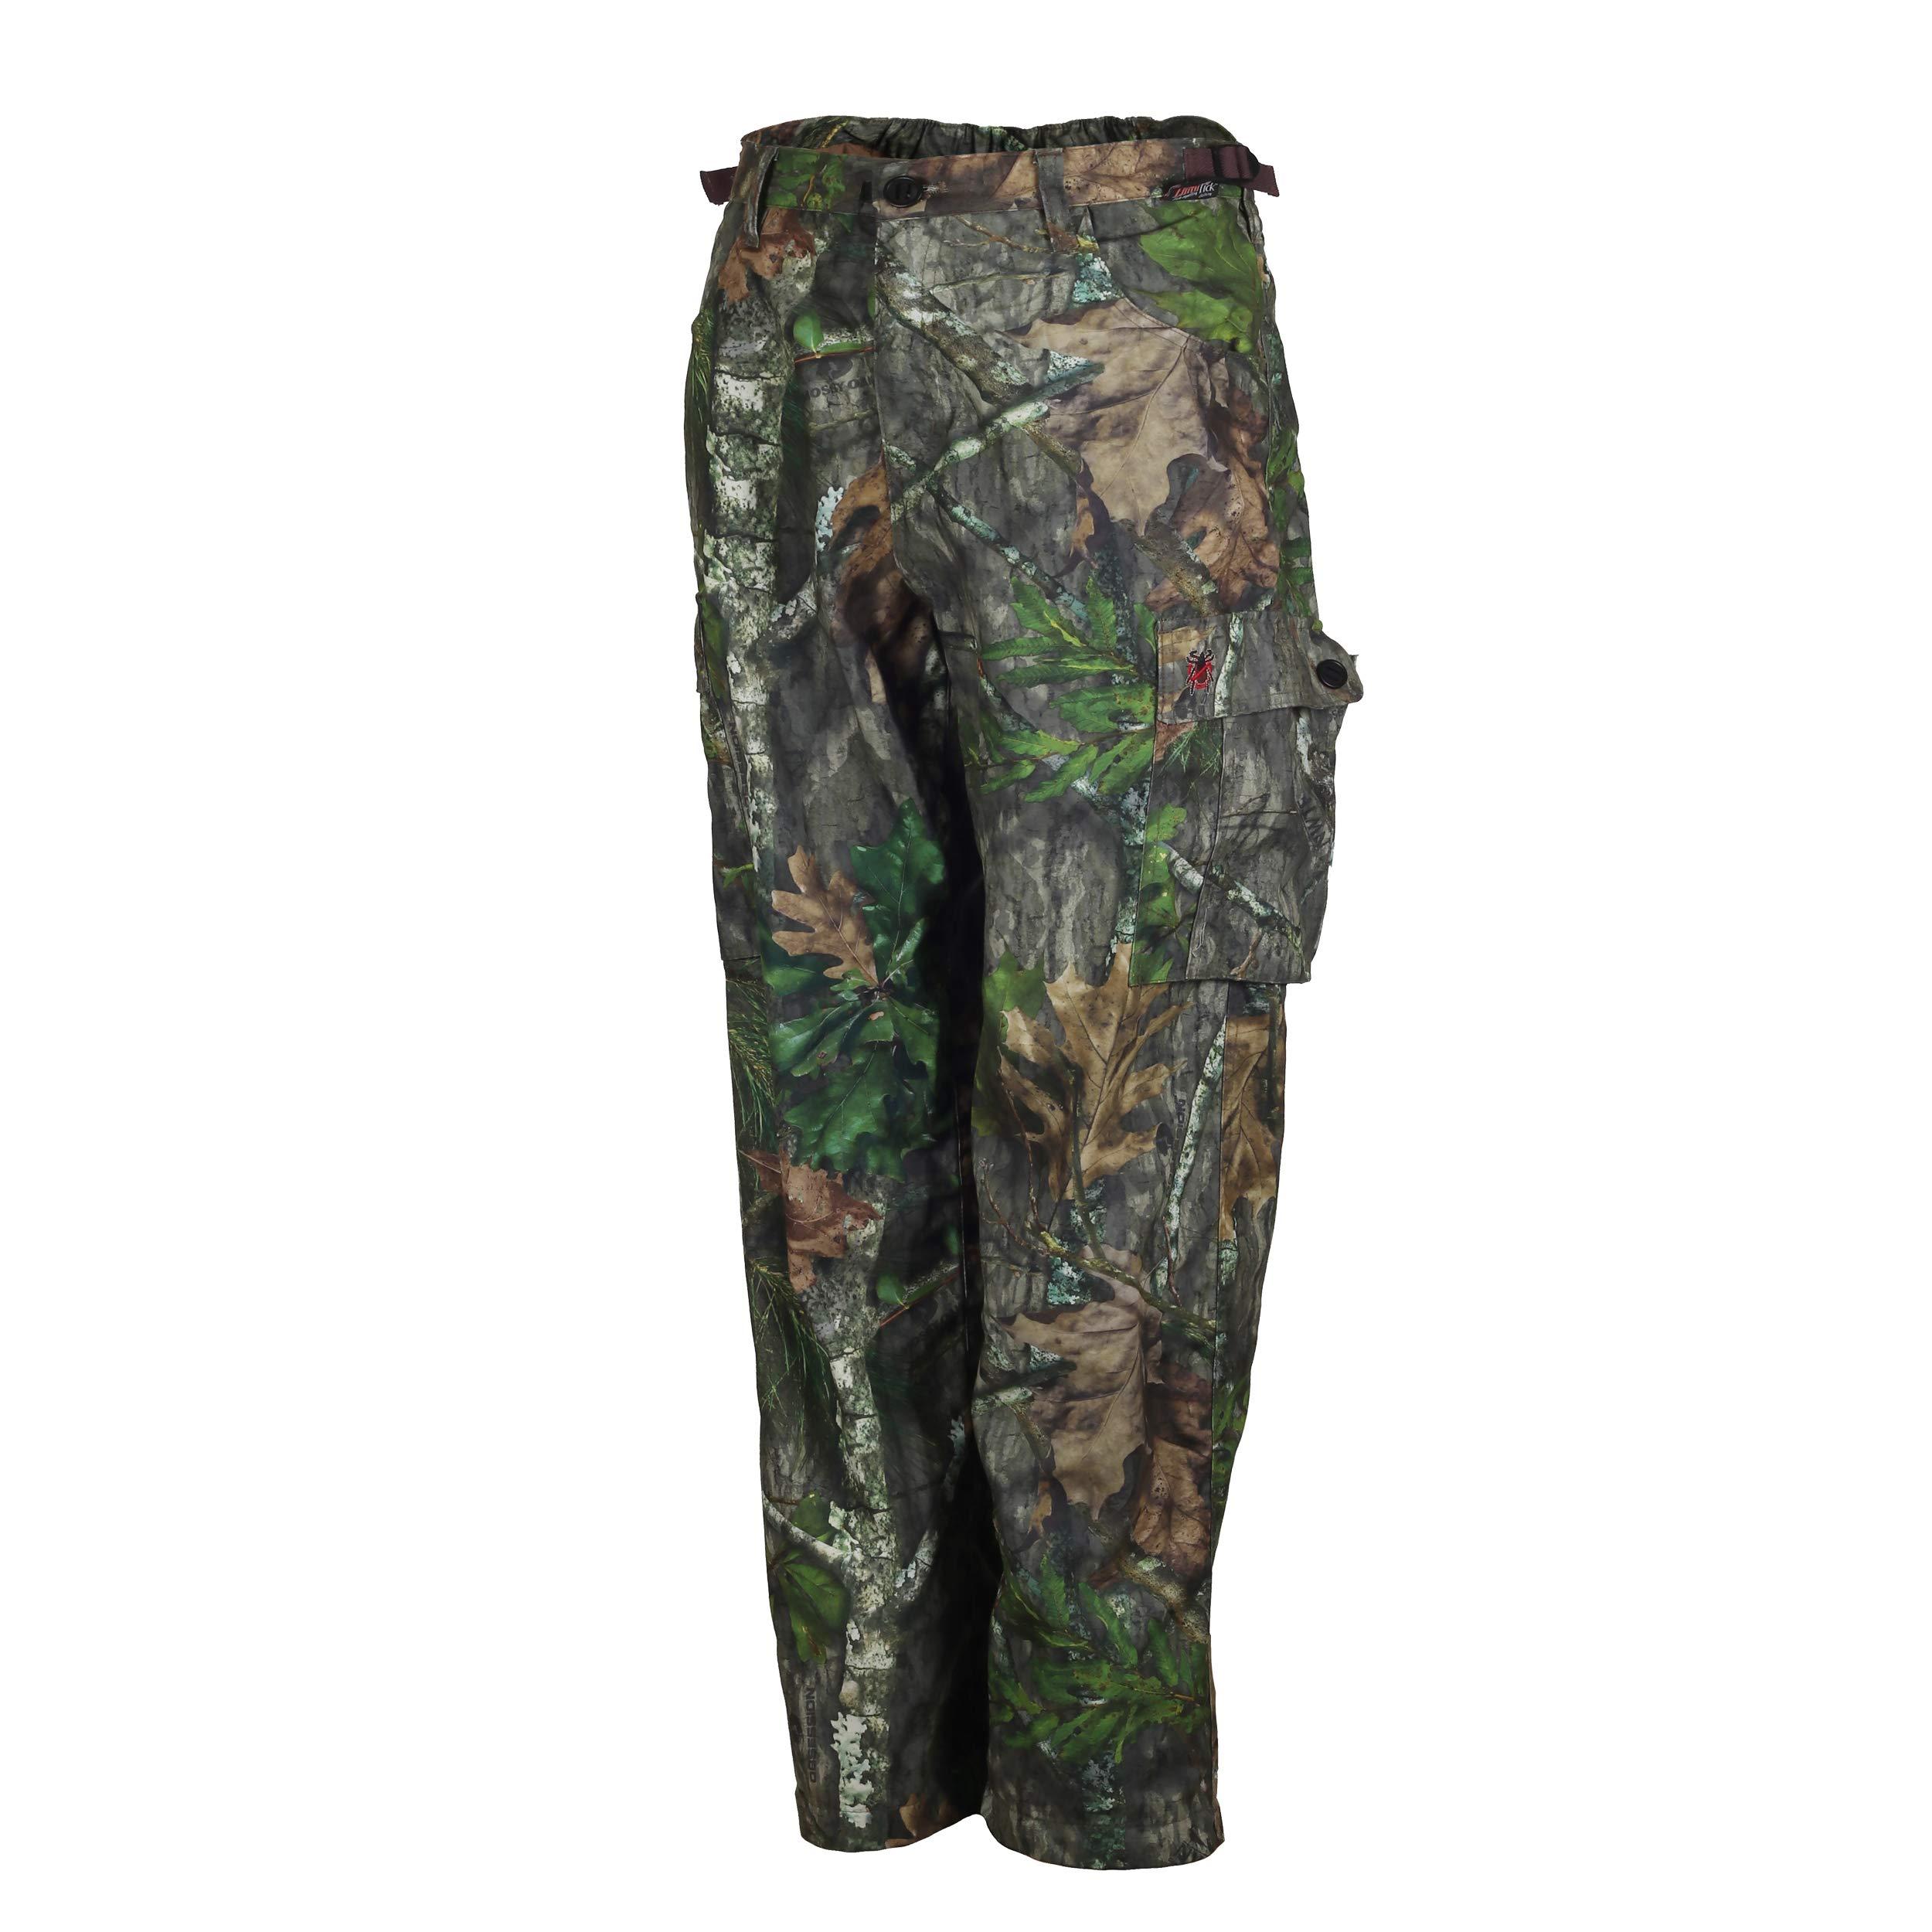 Gamehide ElimiTick Five Pocket Pant (Mossy Oak Obsession, M)